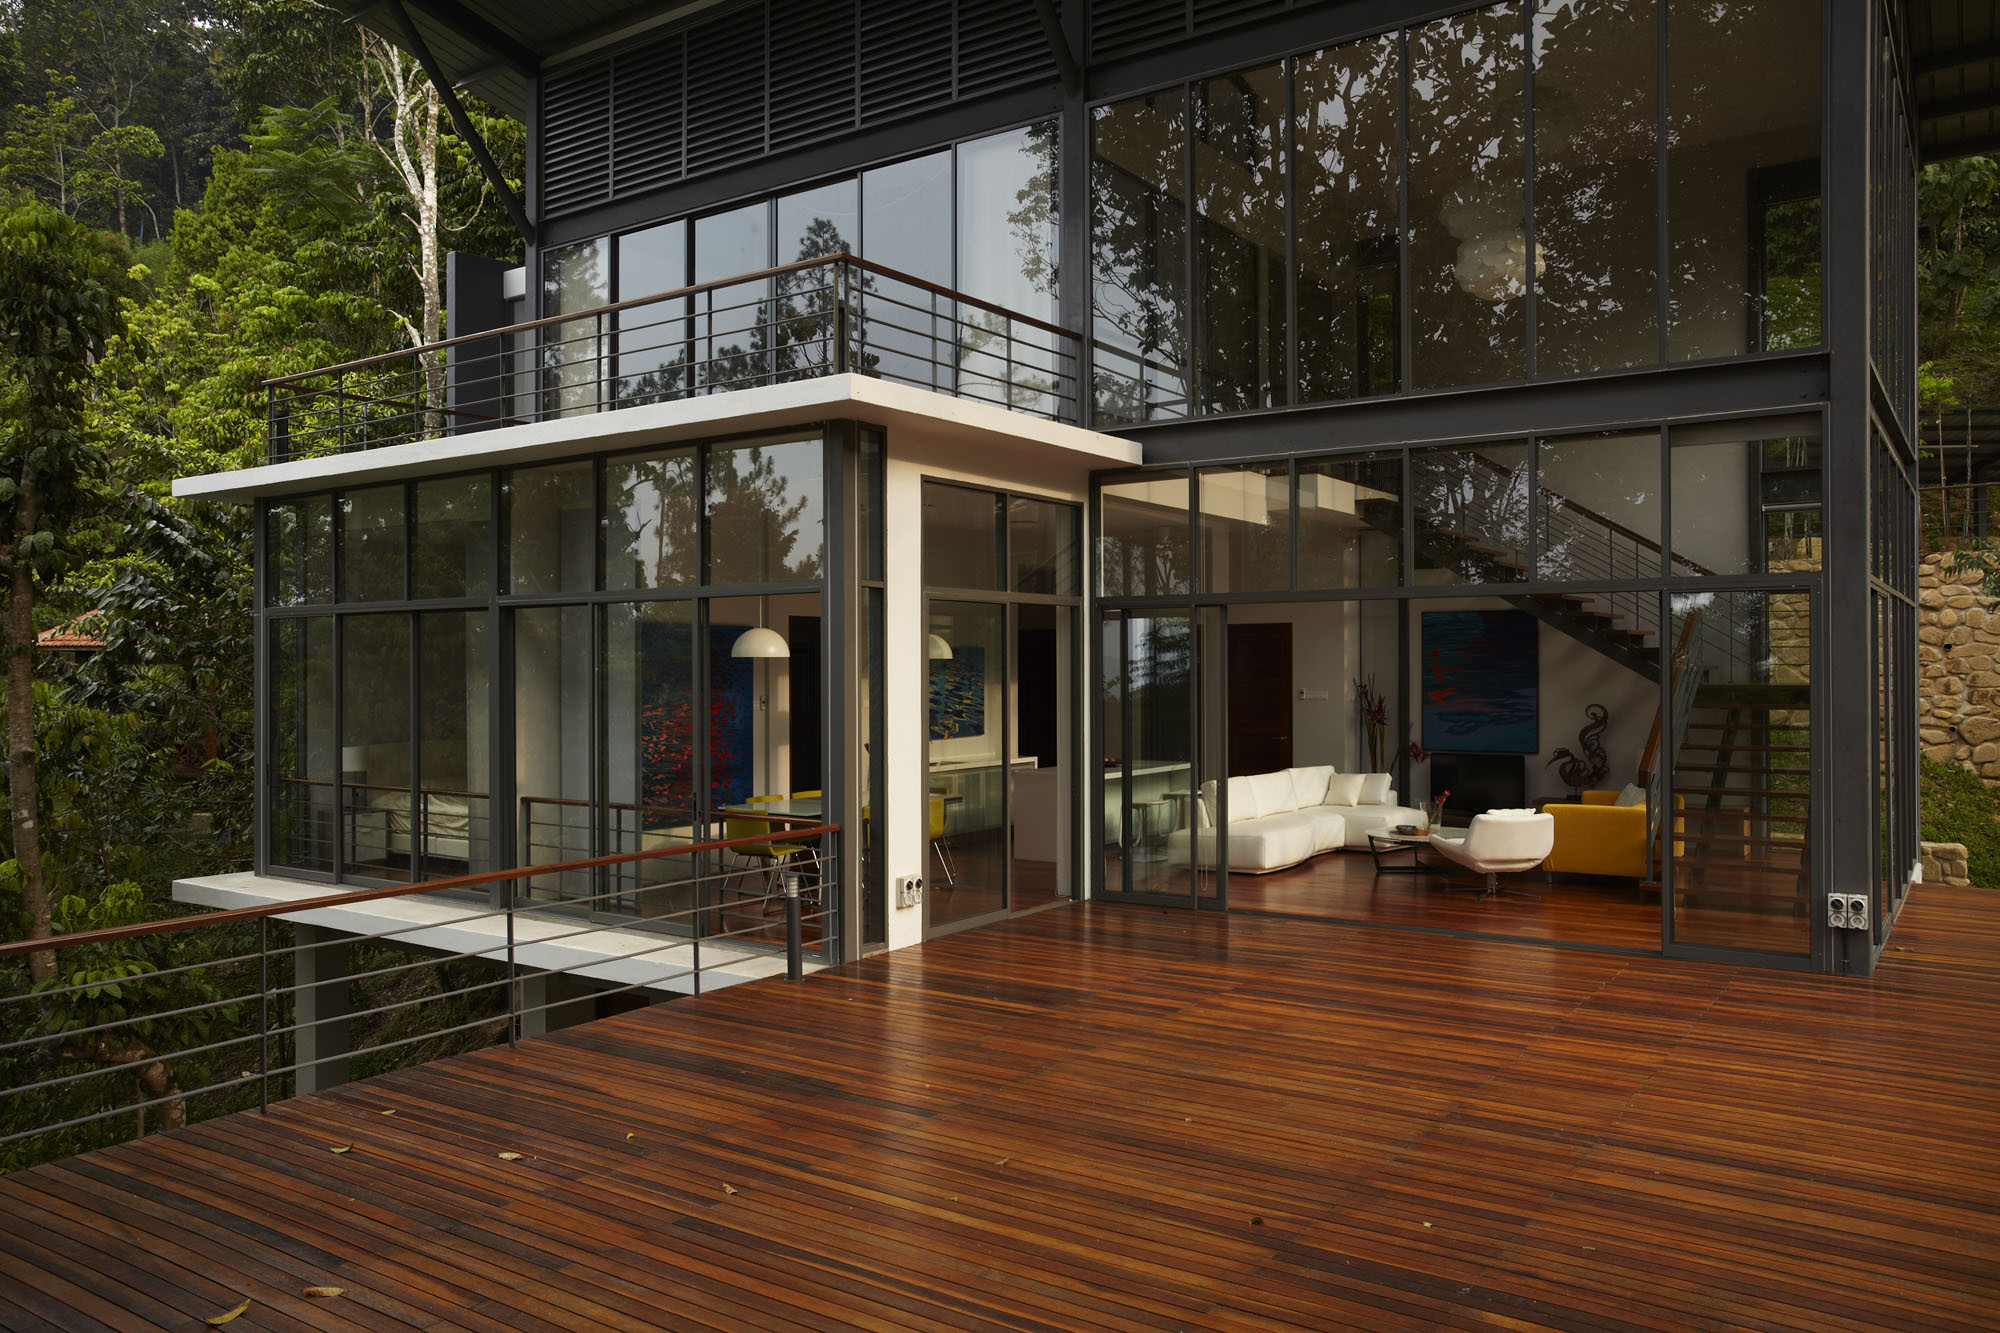 deck house kenneth lim BDSPTVR